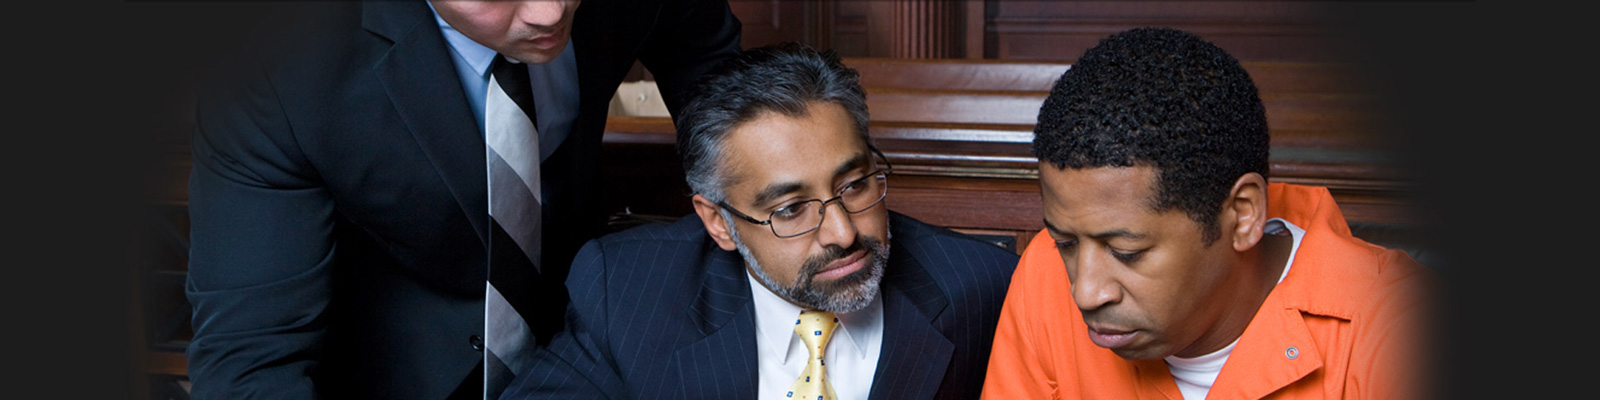 Criminal Charges-Immigration Lawyer San Antonio